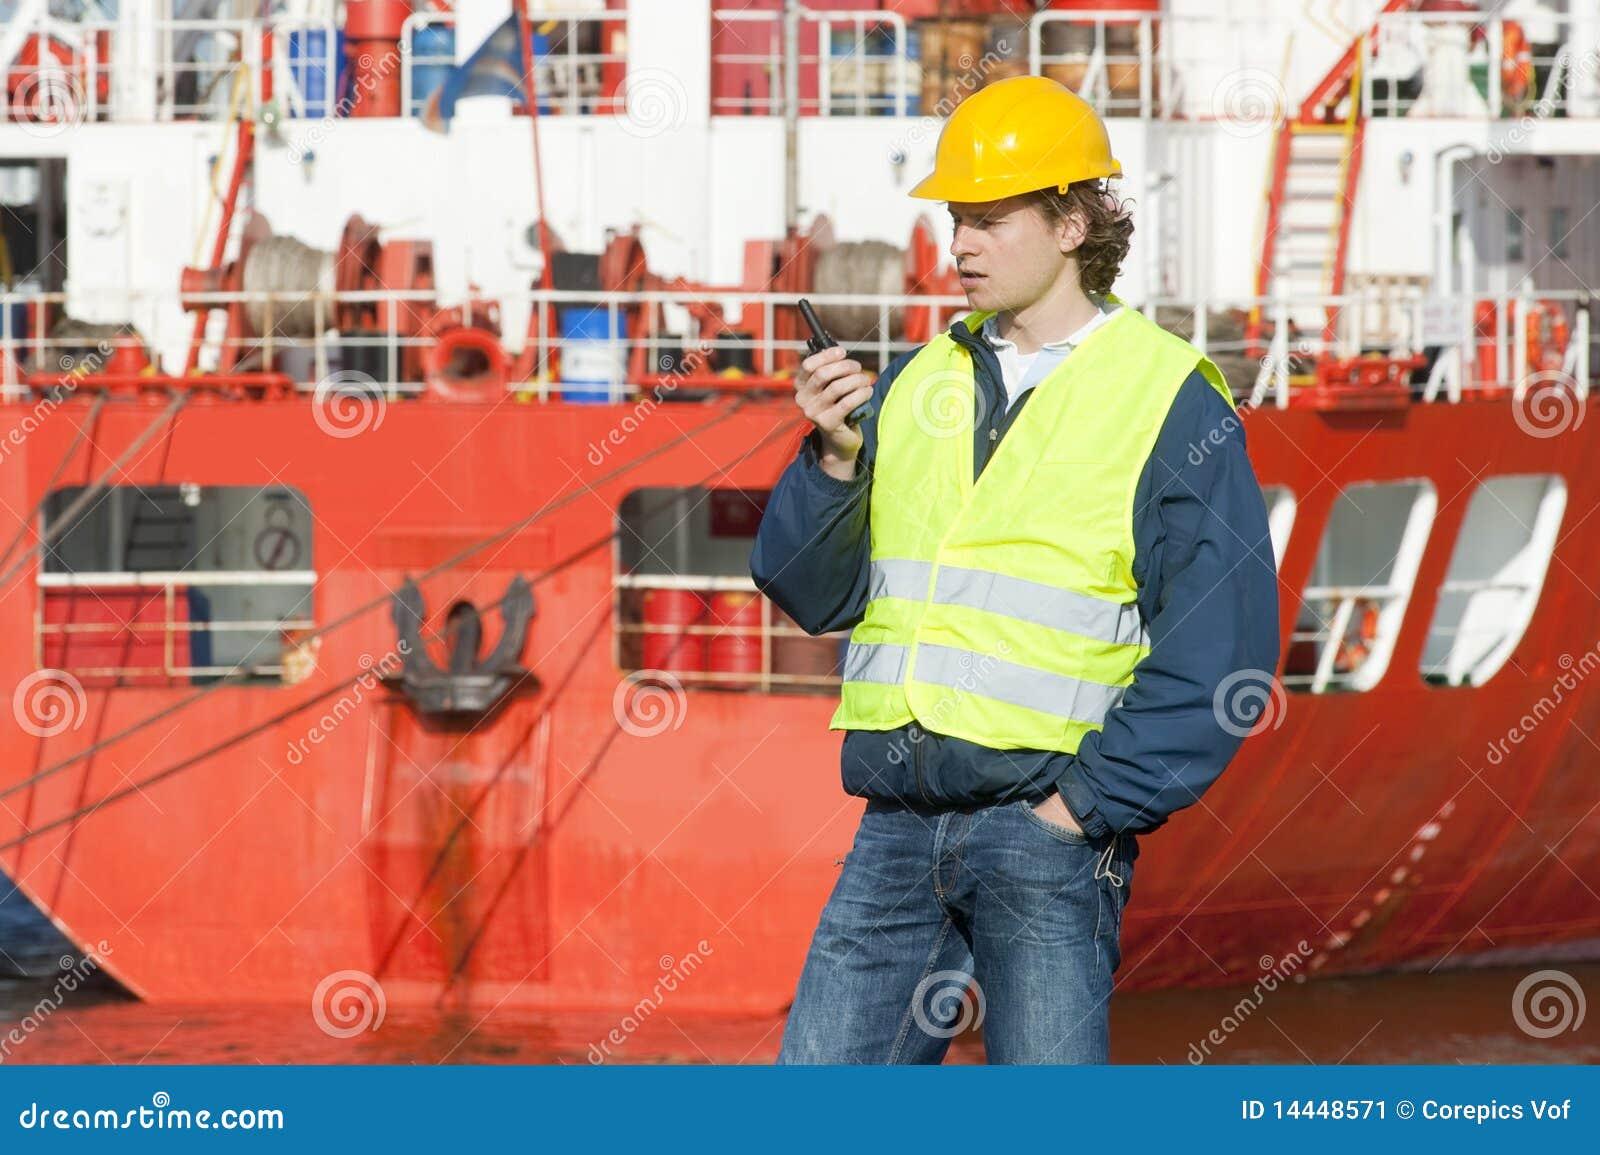 Download Docker stock image. Image of safety, bright, ship, vest - 14448571